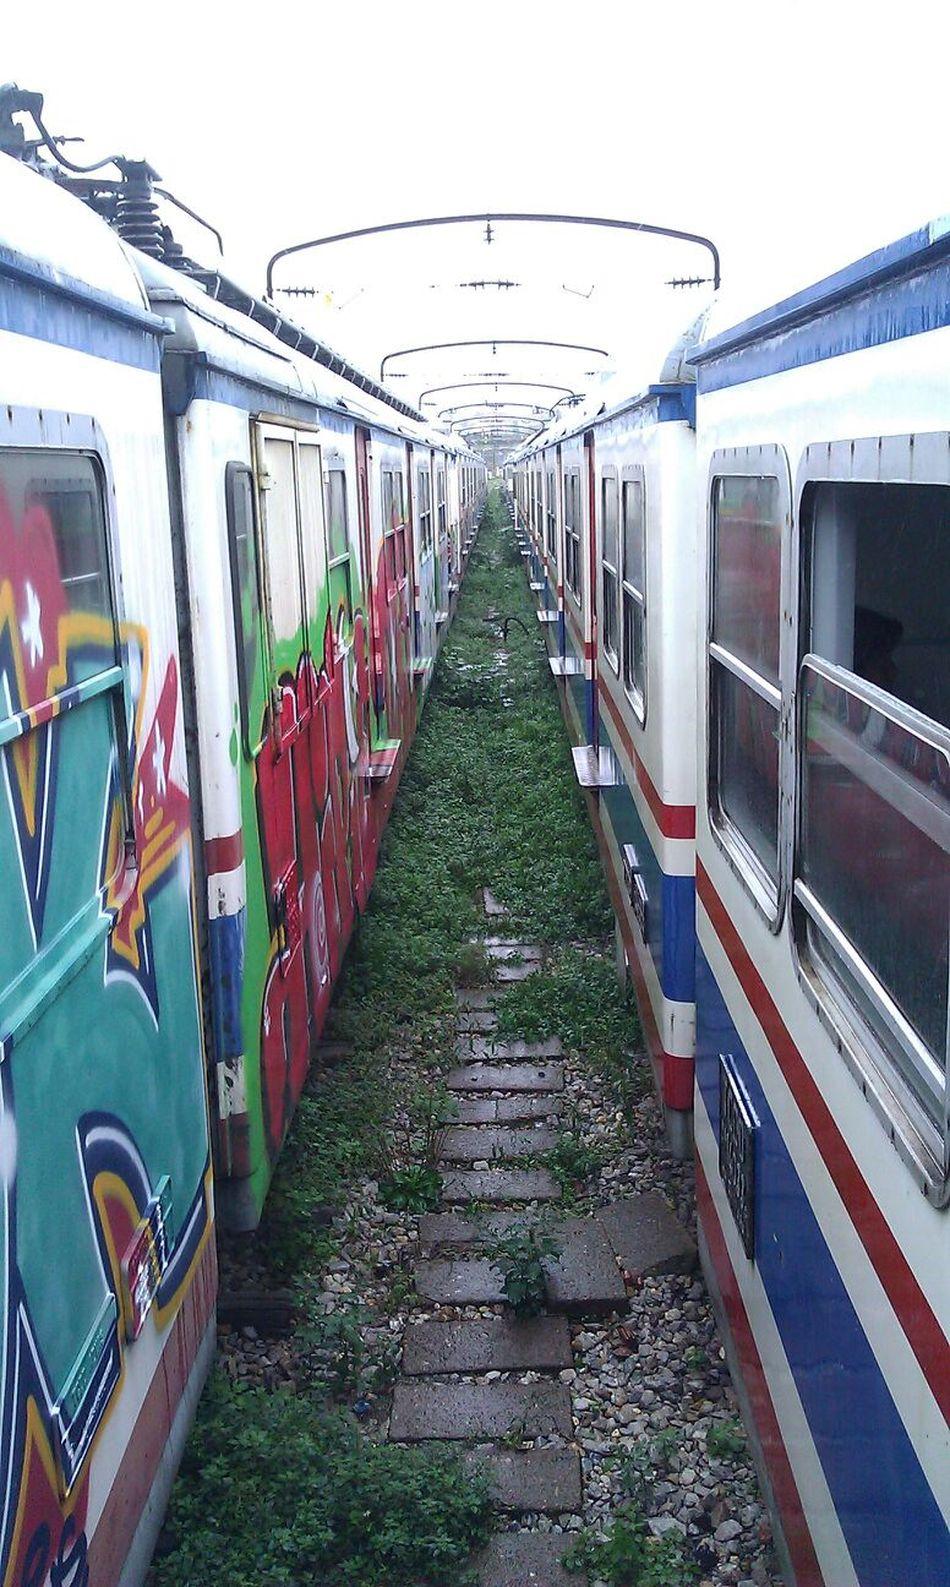 Haydar Haydarpasa Perpective Steel Taking Photos Art City Train Traveling Hi!